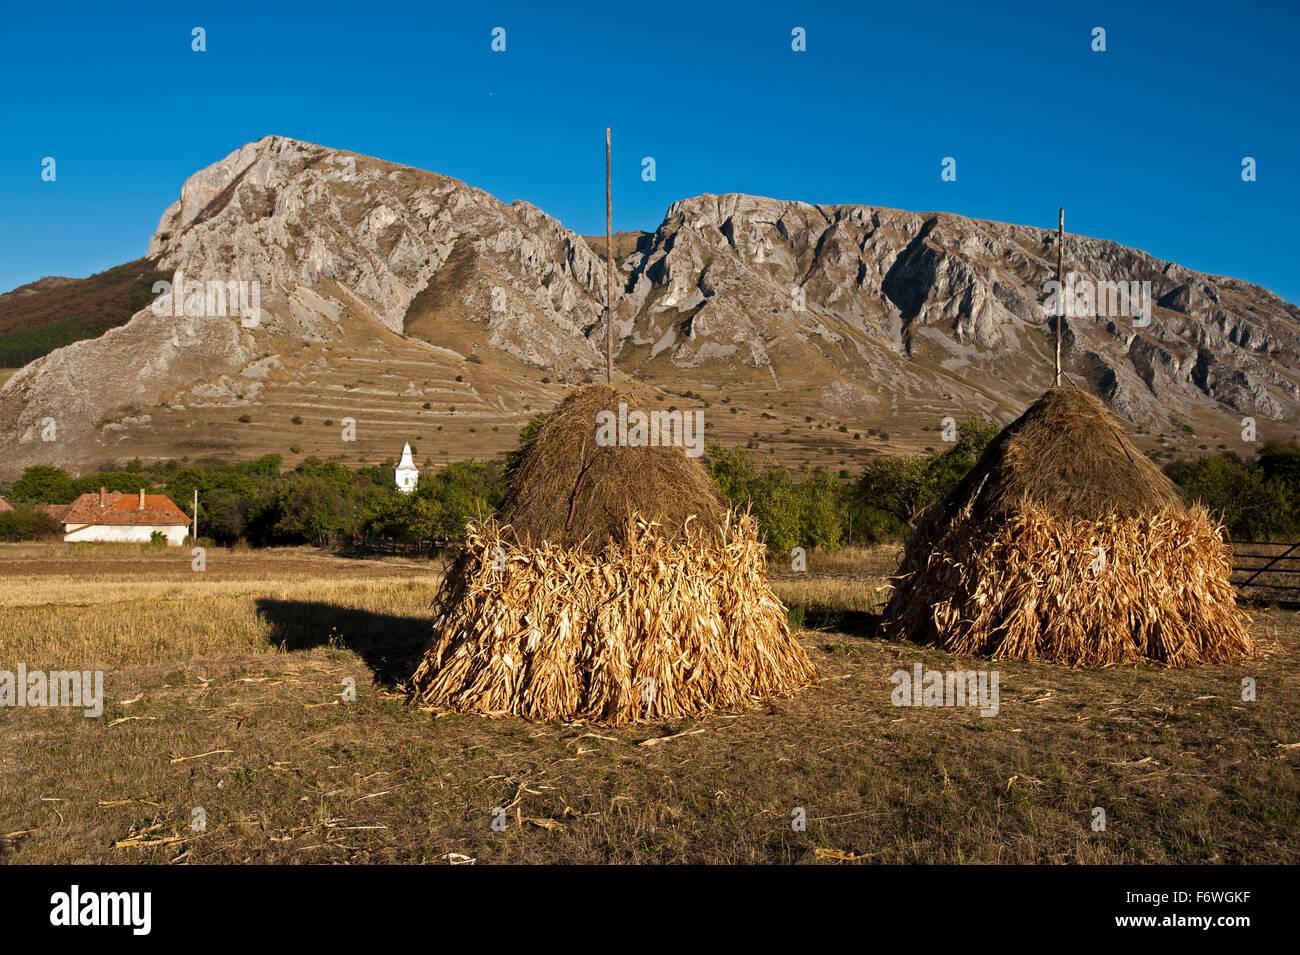 Hay stacks near the village of Rimetea, Alba, Transylvania, Romania - Stock Image